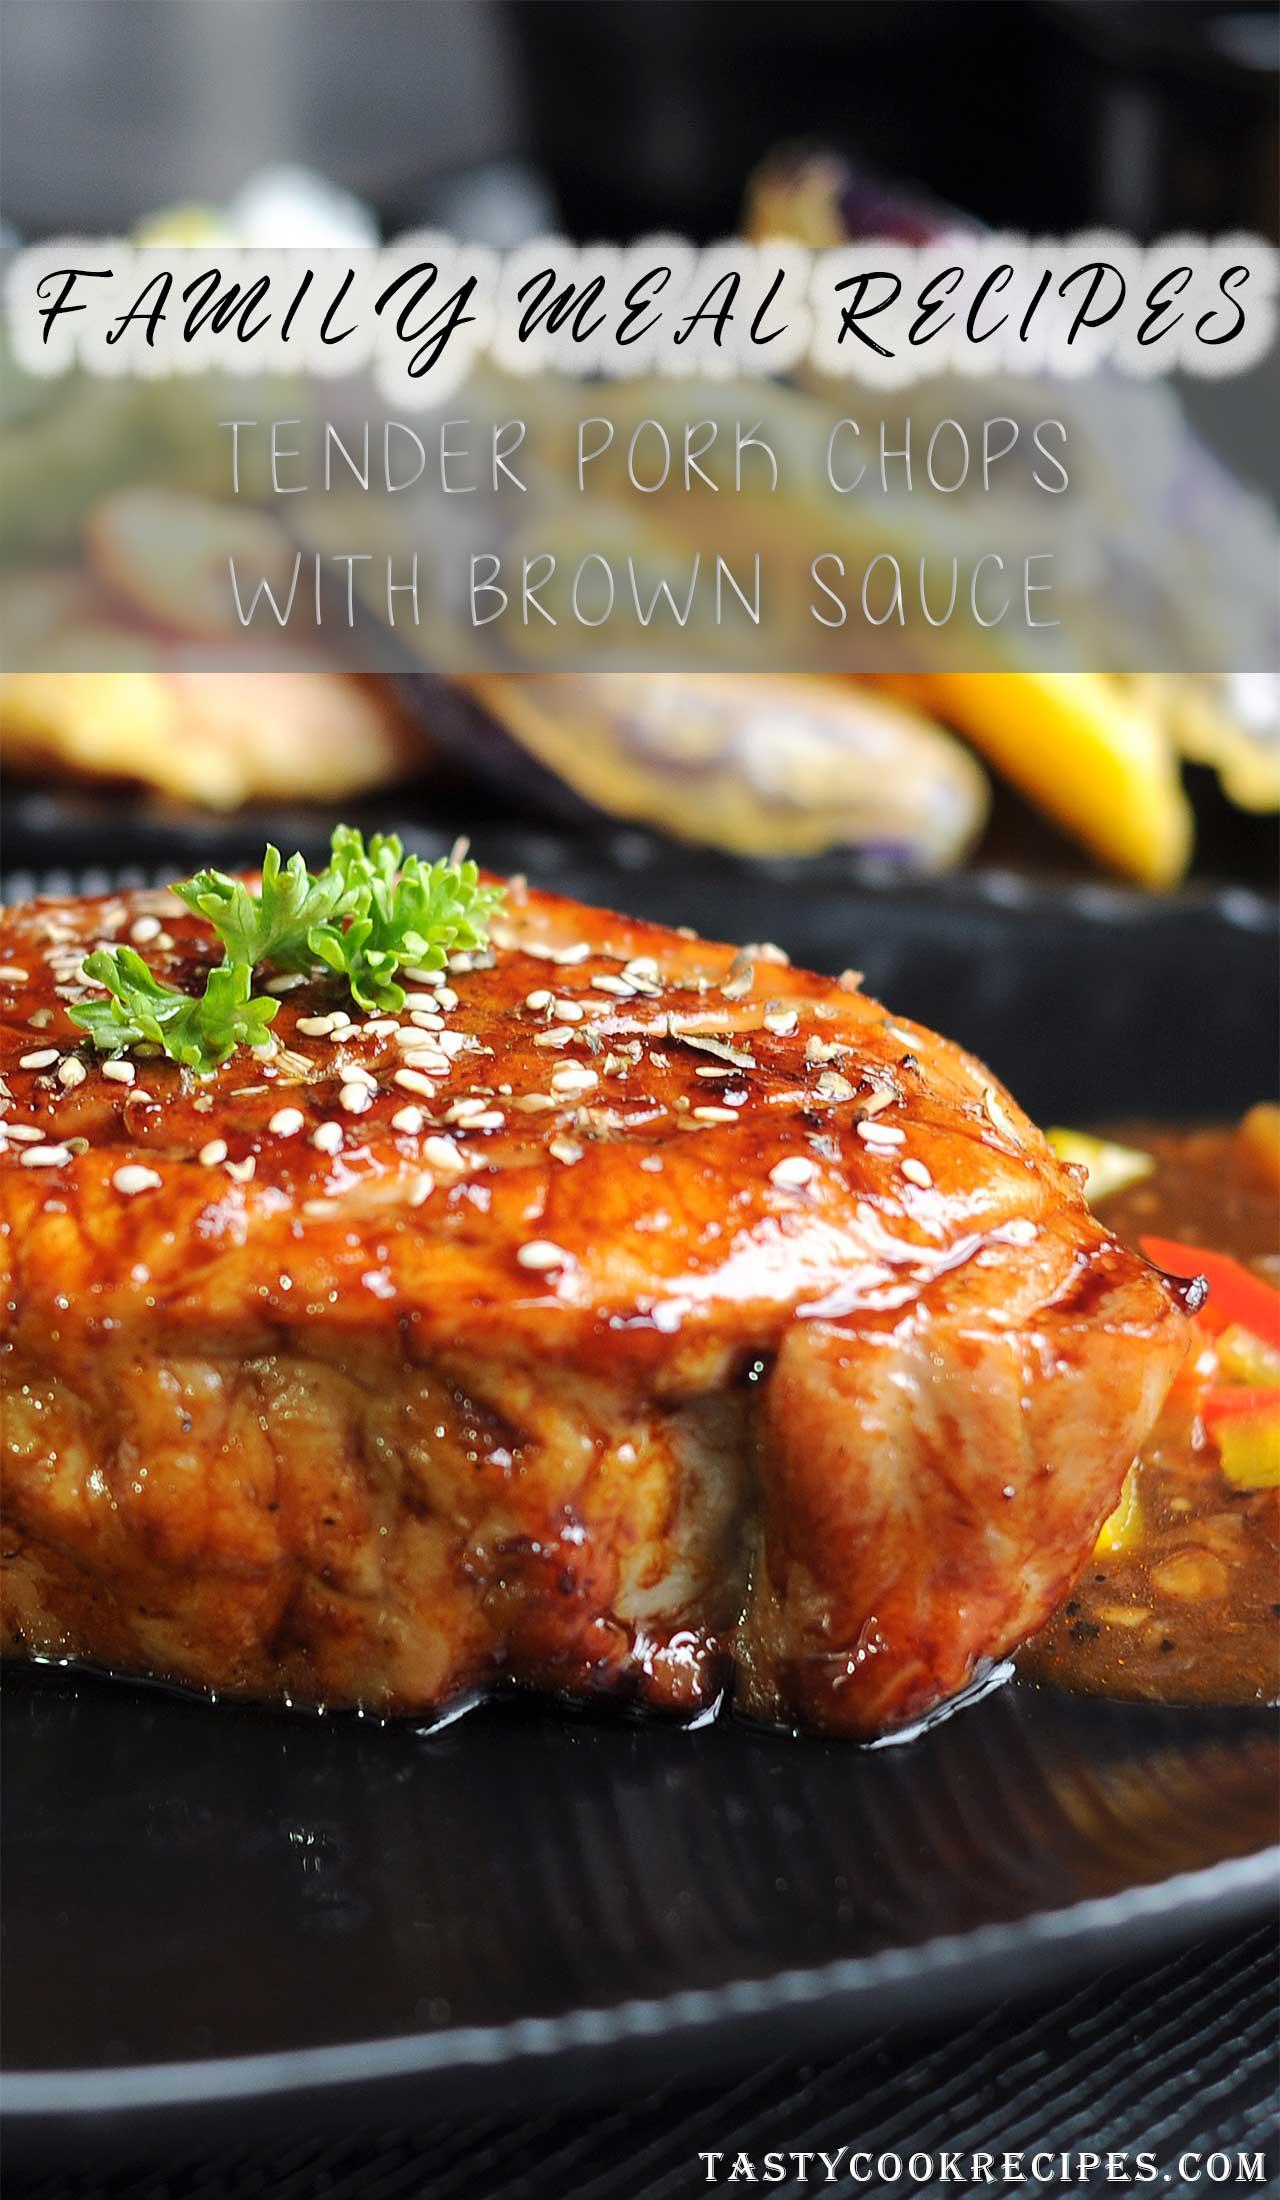 pork in the oven recipe, pork chops brown sauce recipes